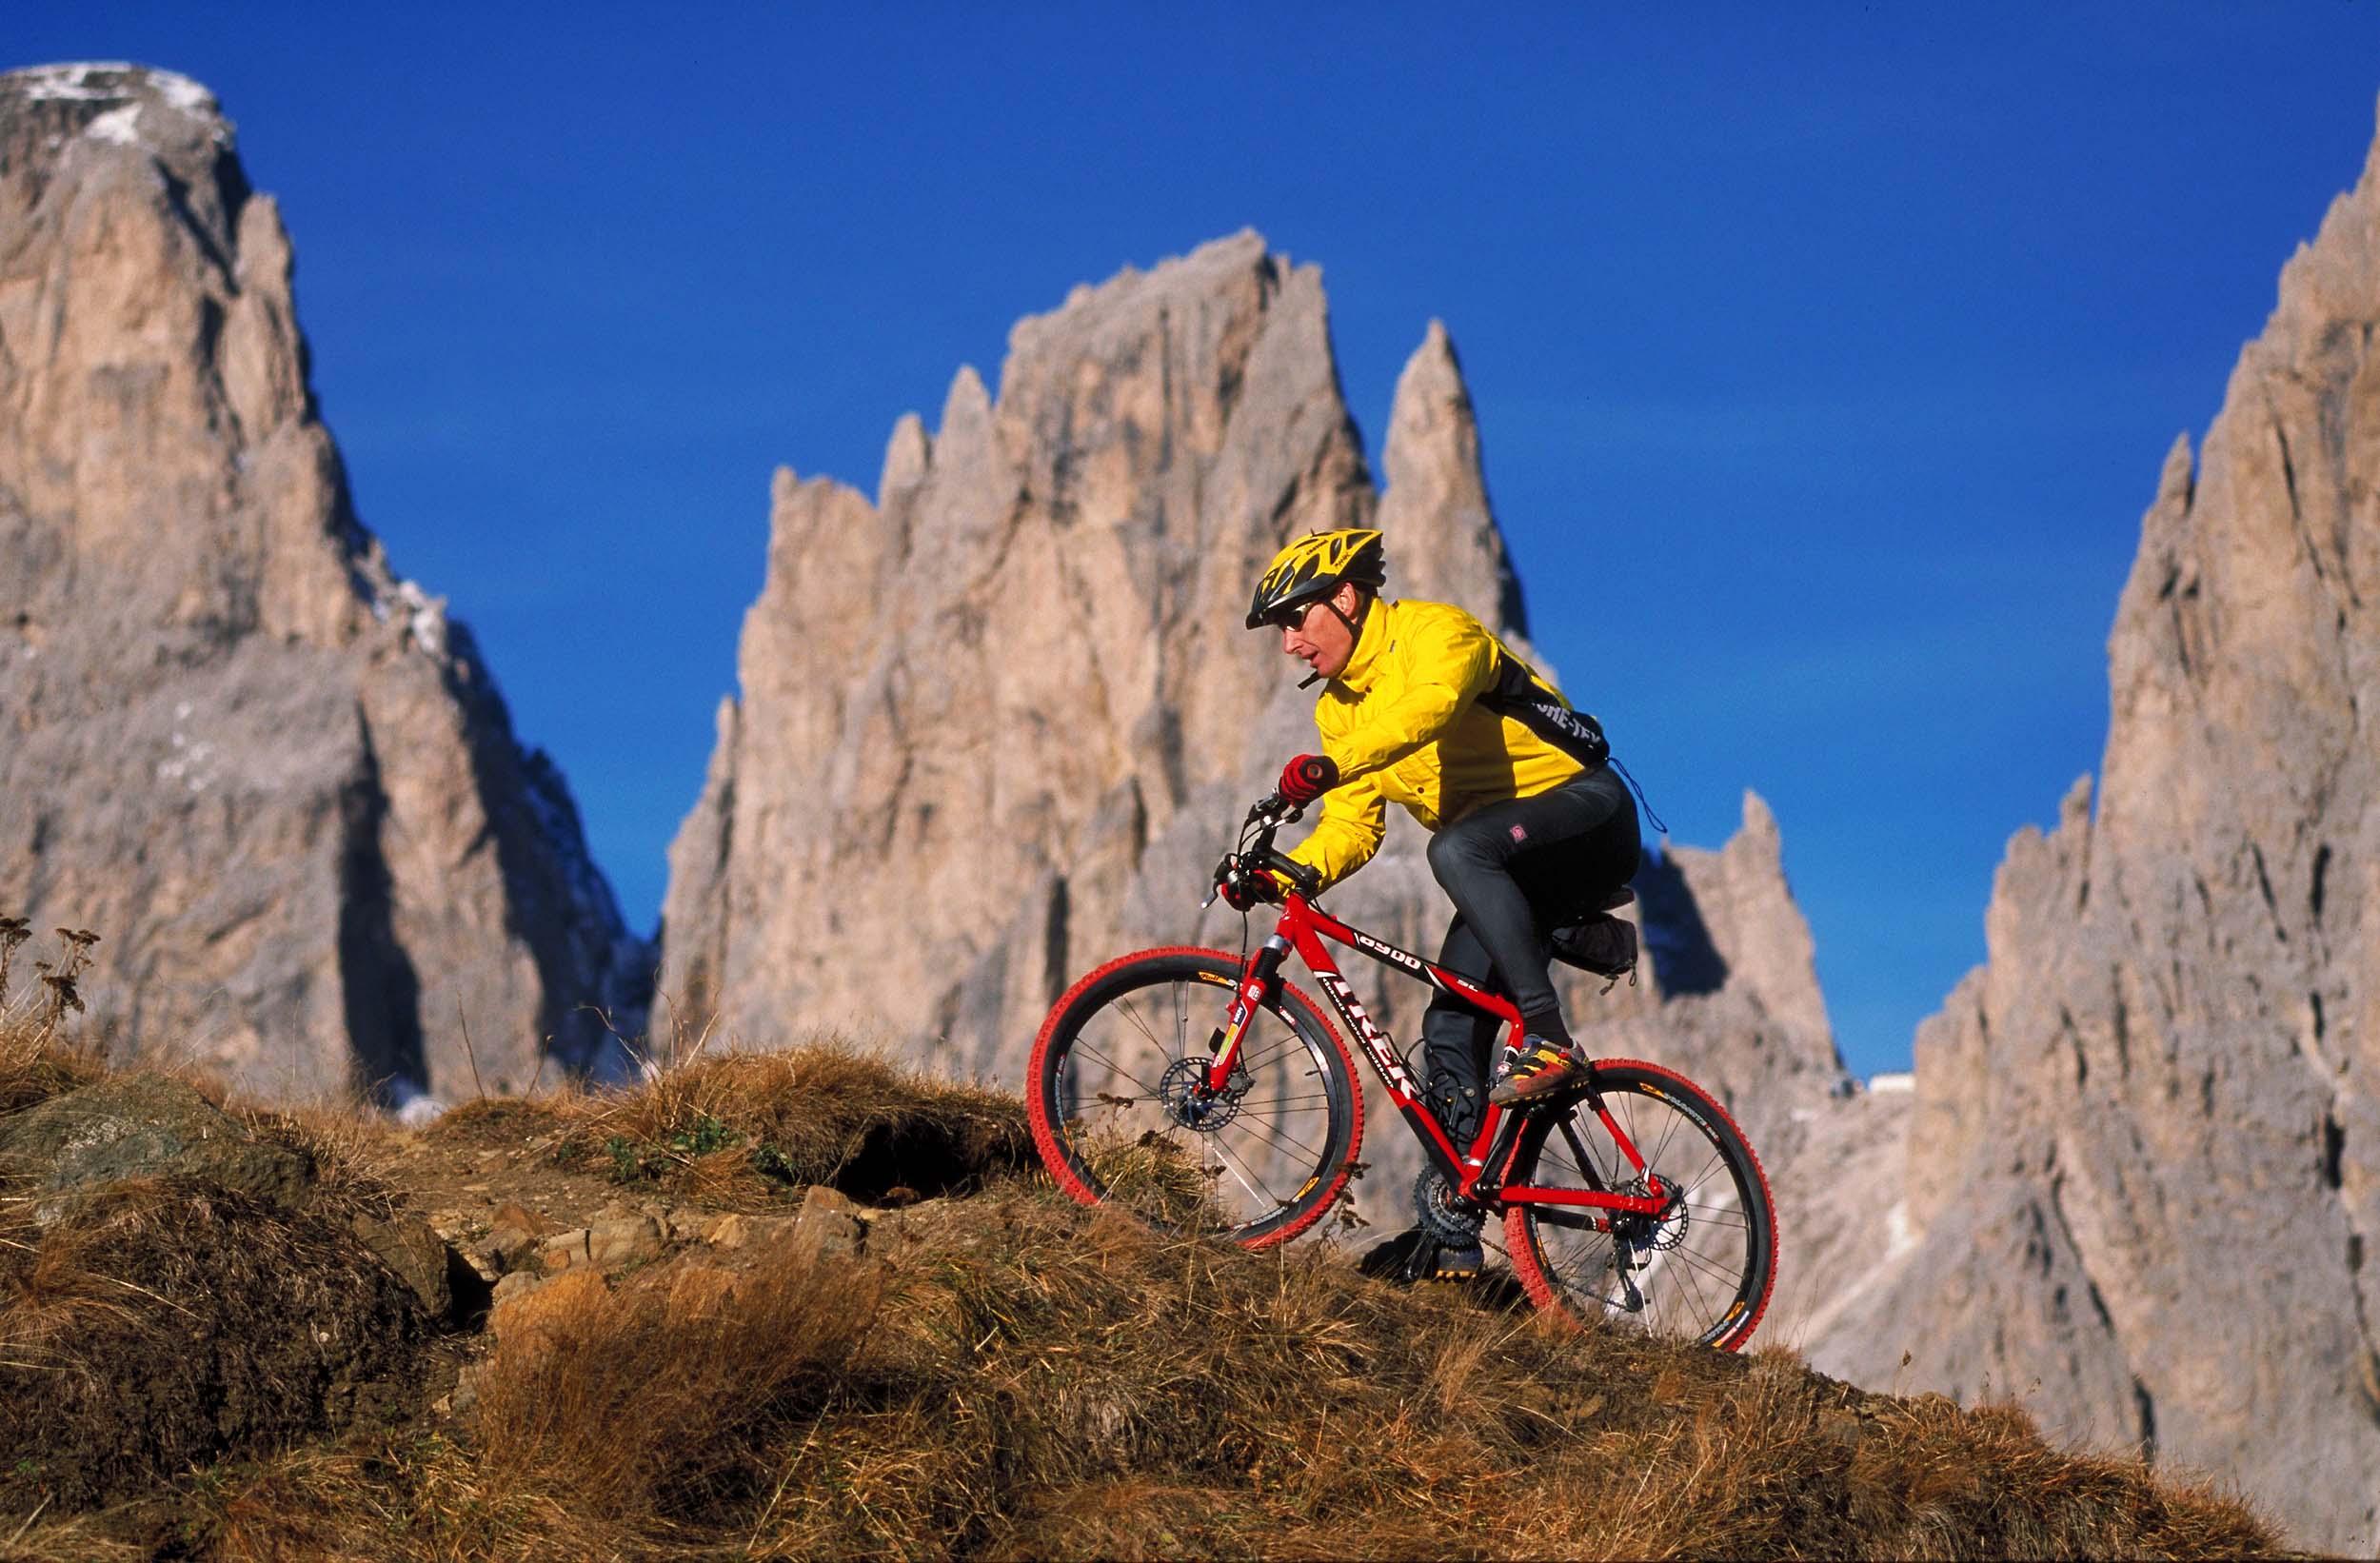 Bike Rudi vor Zinnen qf Img0066 bb_shp2500px_JPGQU5mittel_381KB_real474K.jpg